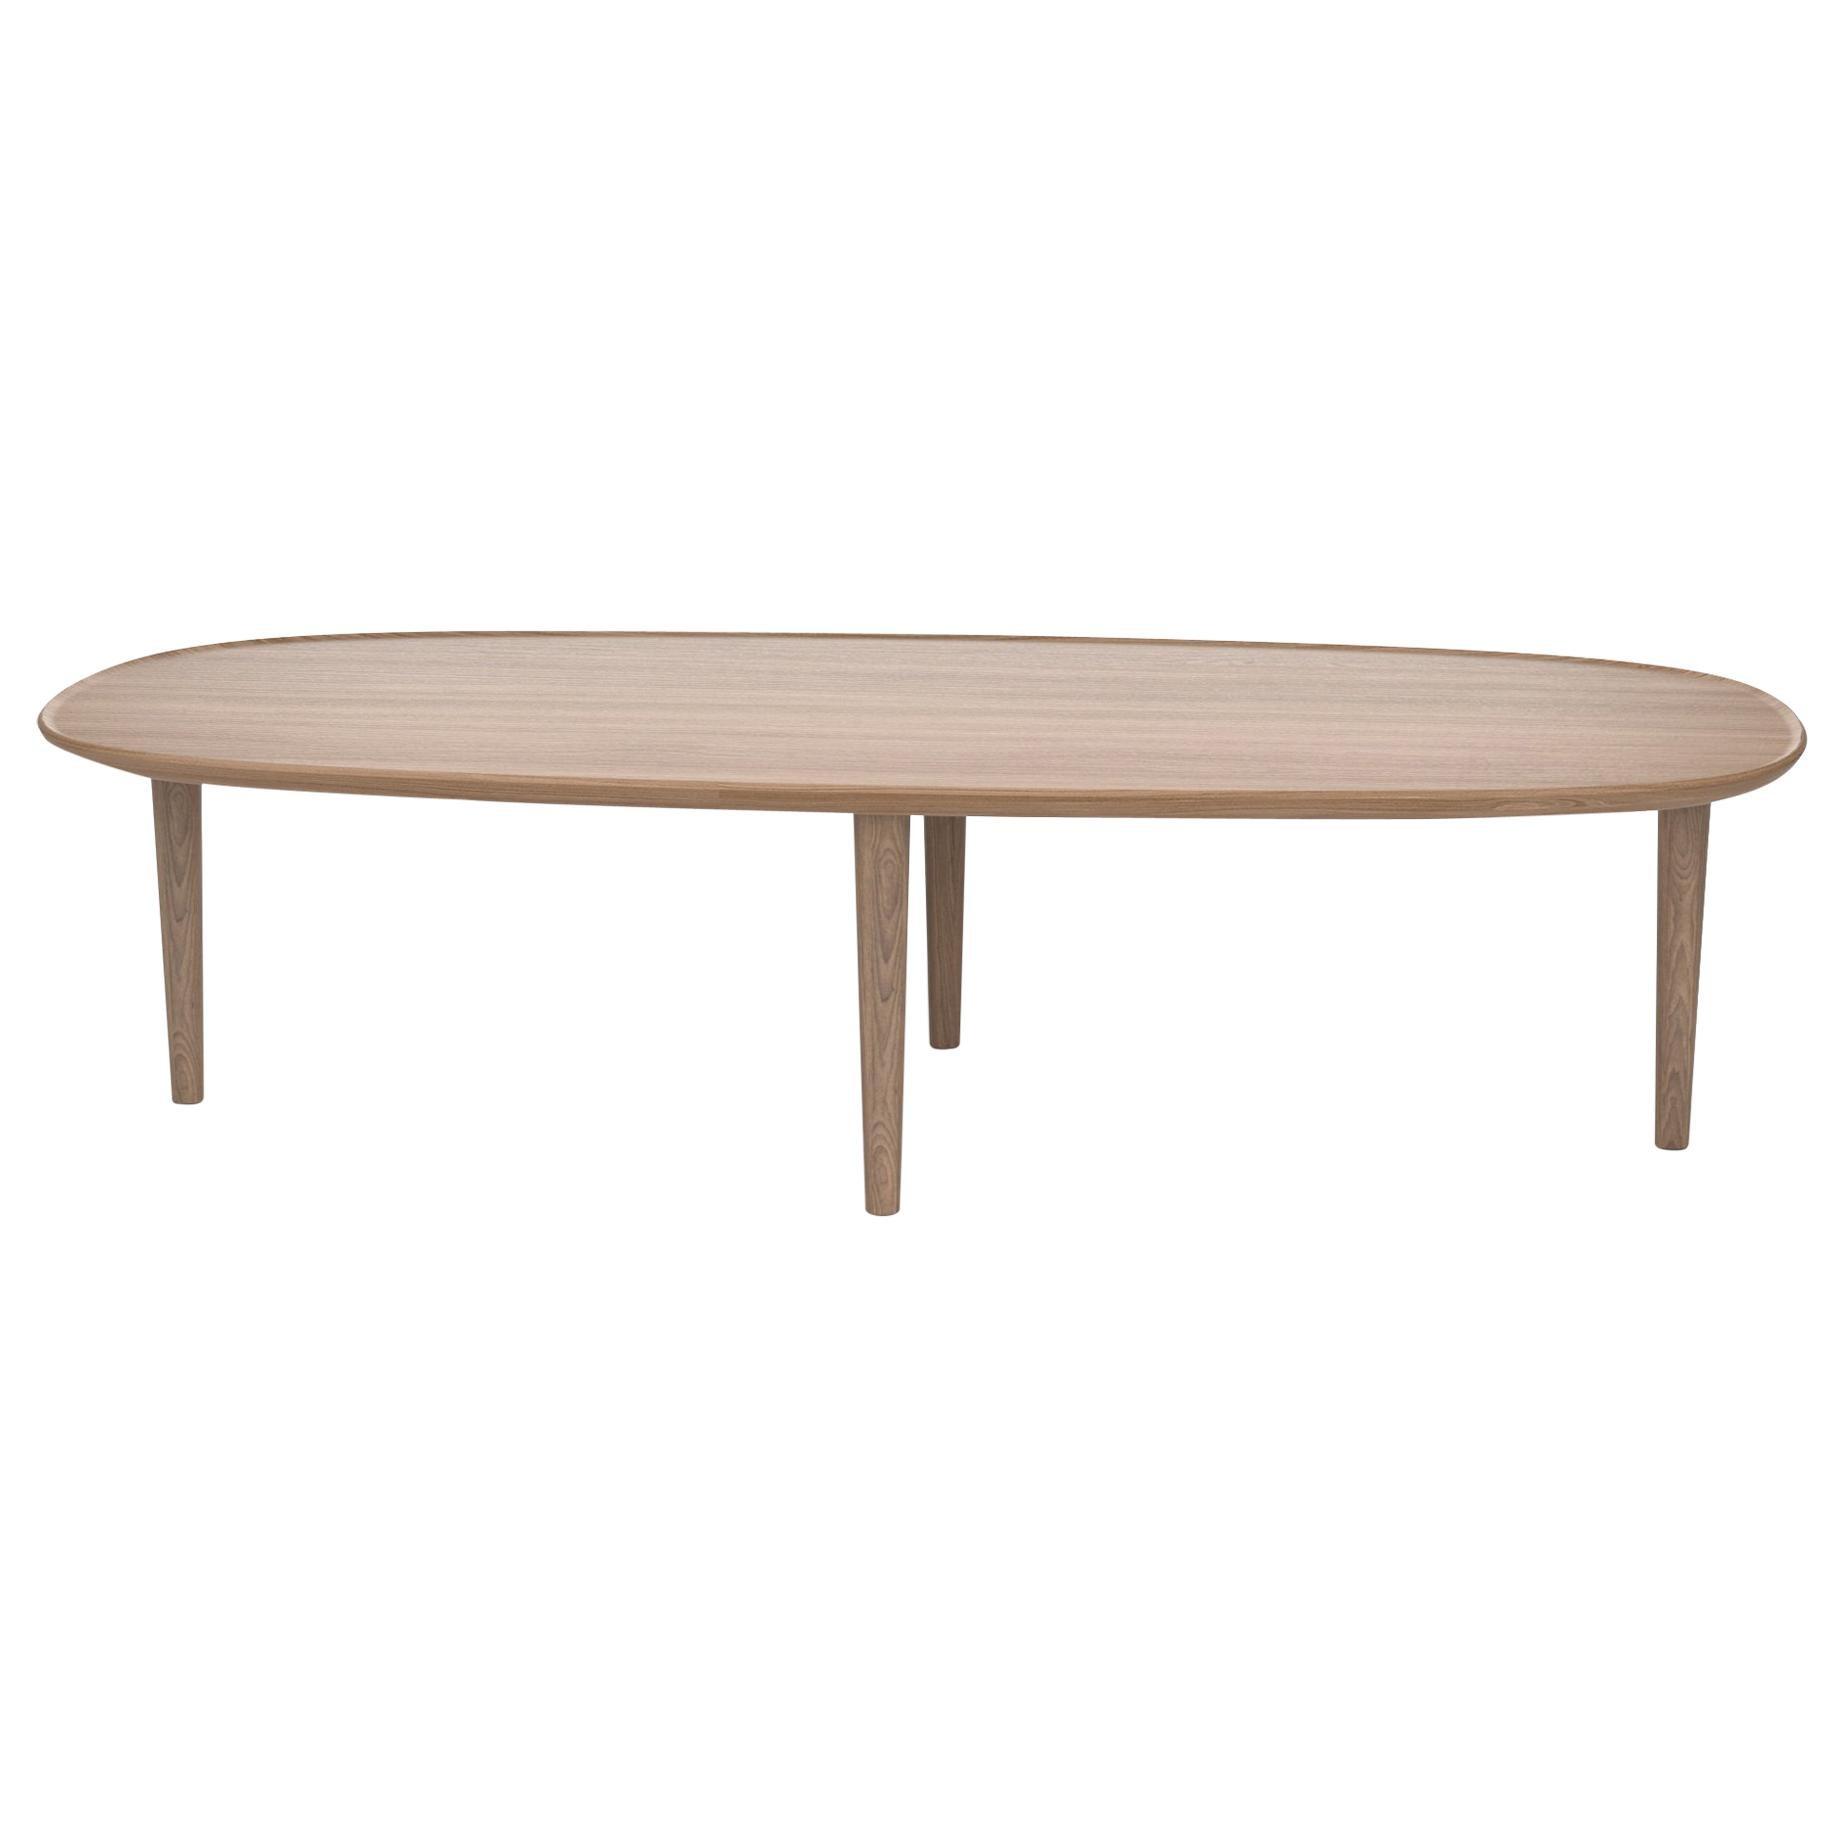 Fiori Table 140, Dark Oak